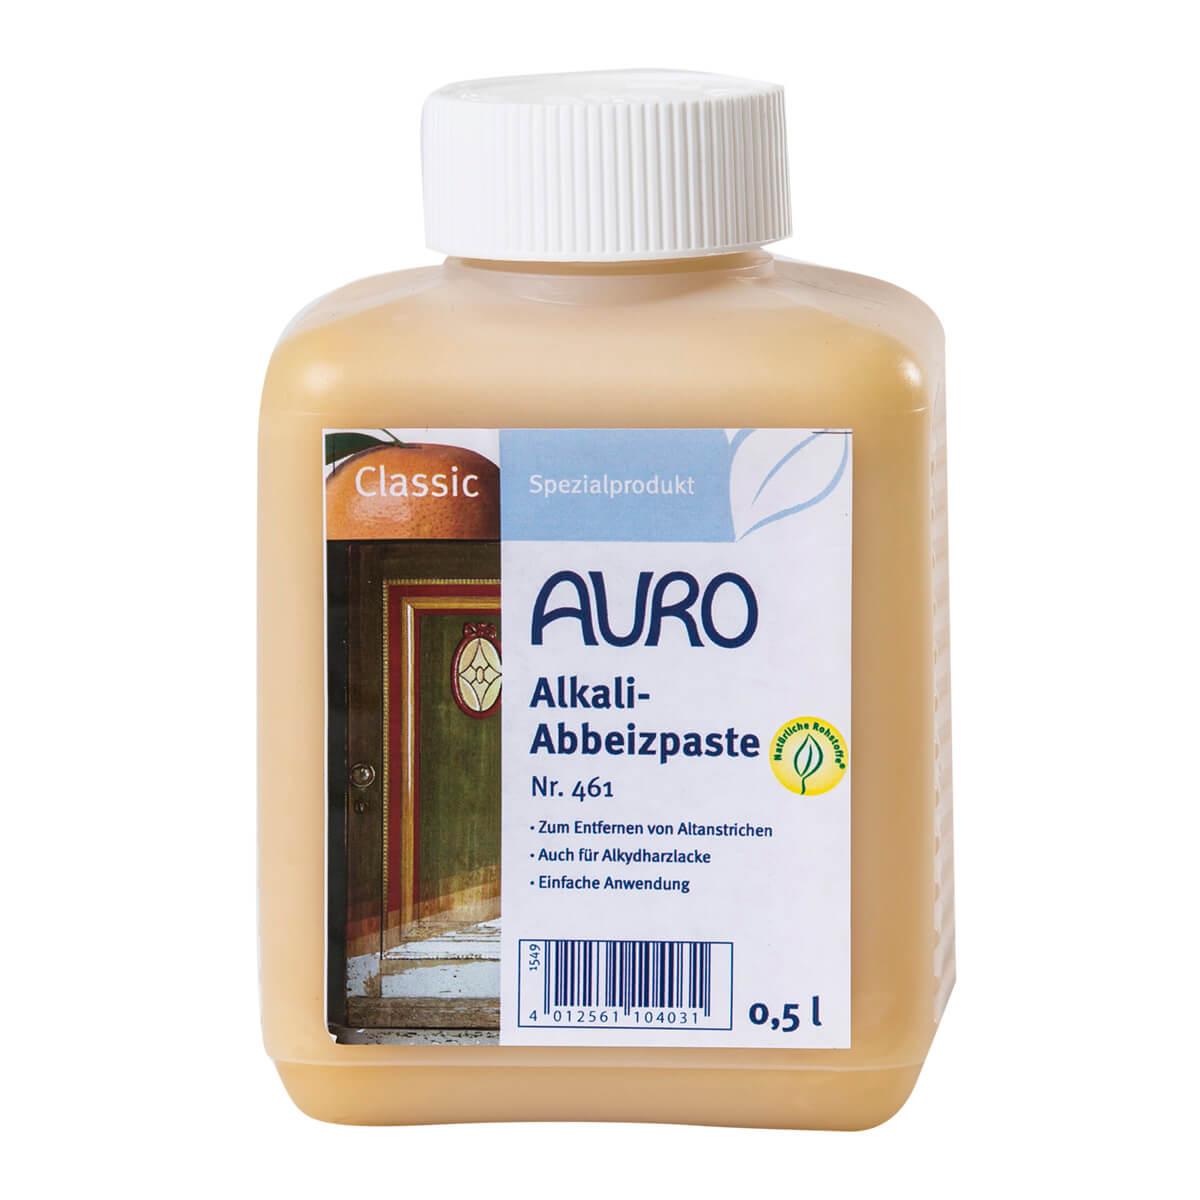 AURO Alkali-Abbeizpaste Nr. 461 - 0,50 L